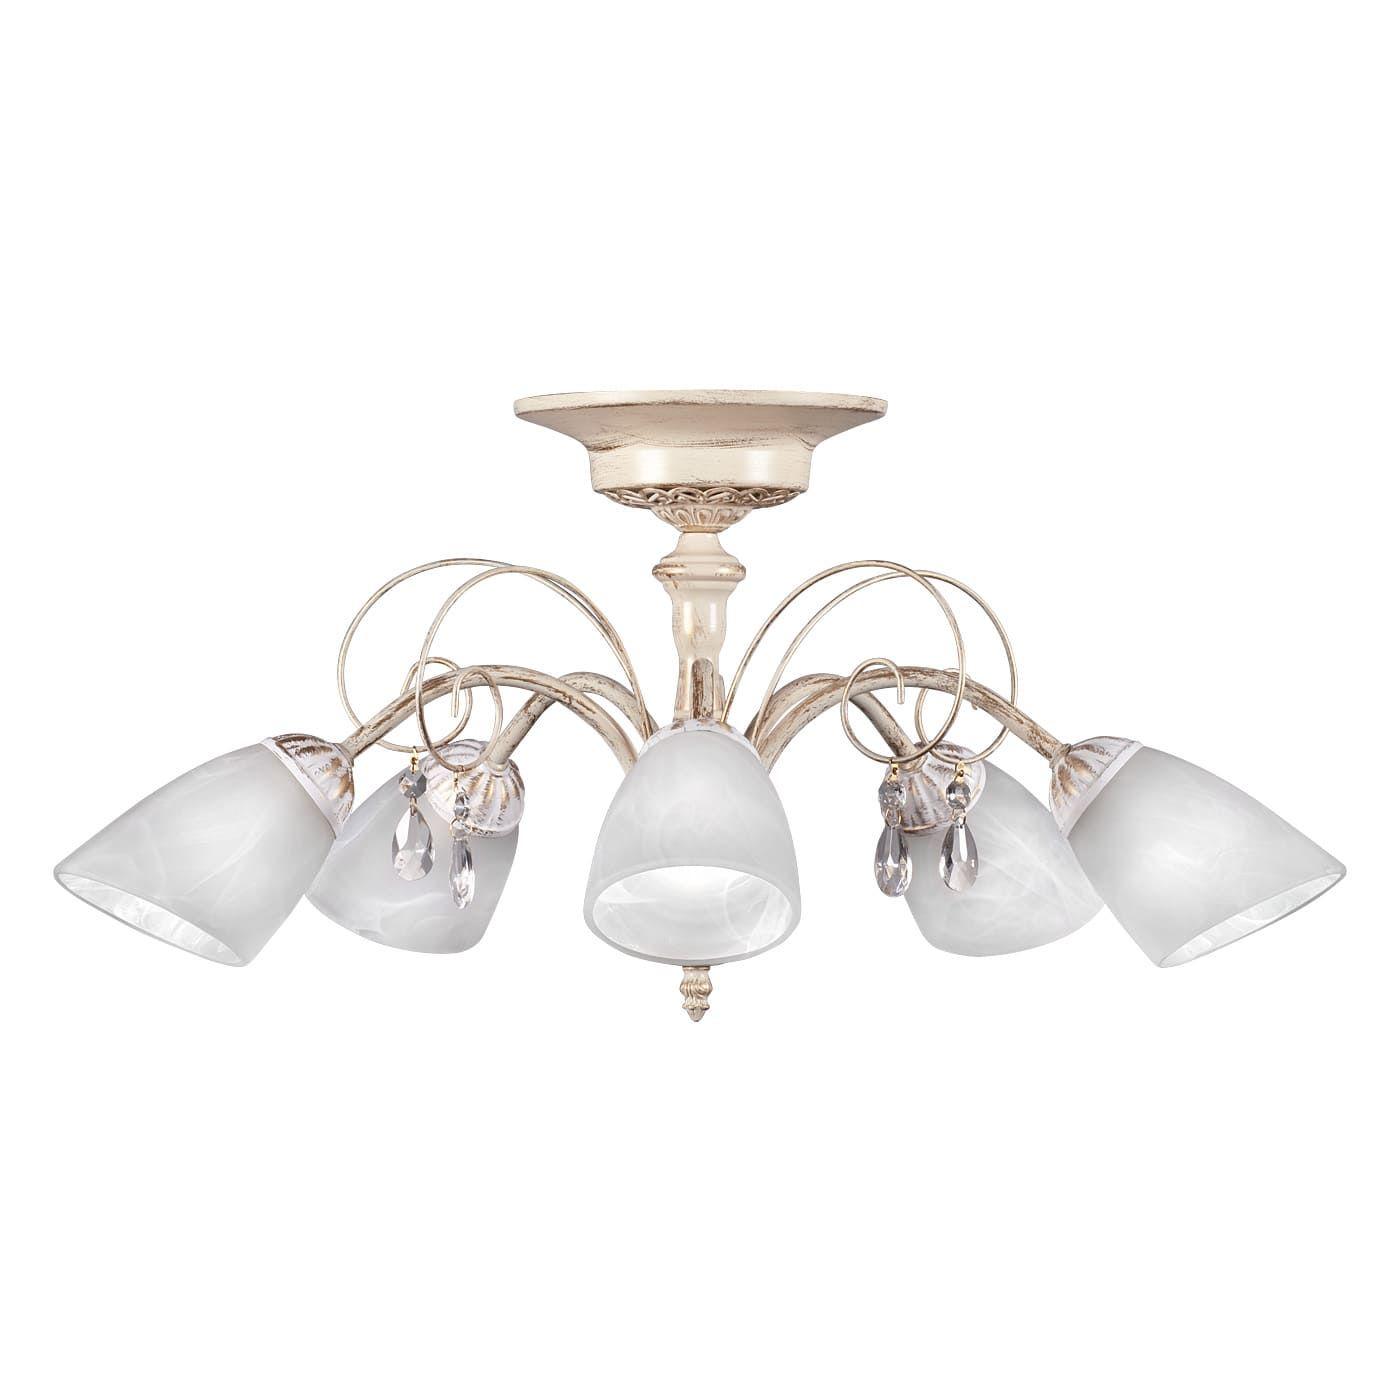 PETRASVET / Ceiling chandelier S2120, 5xE14 max. 60W